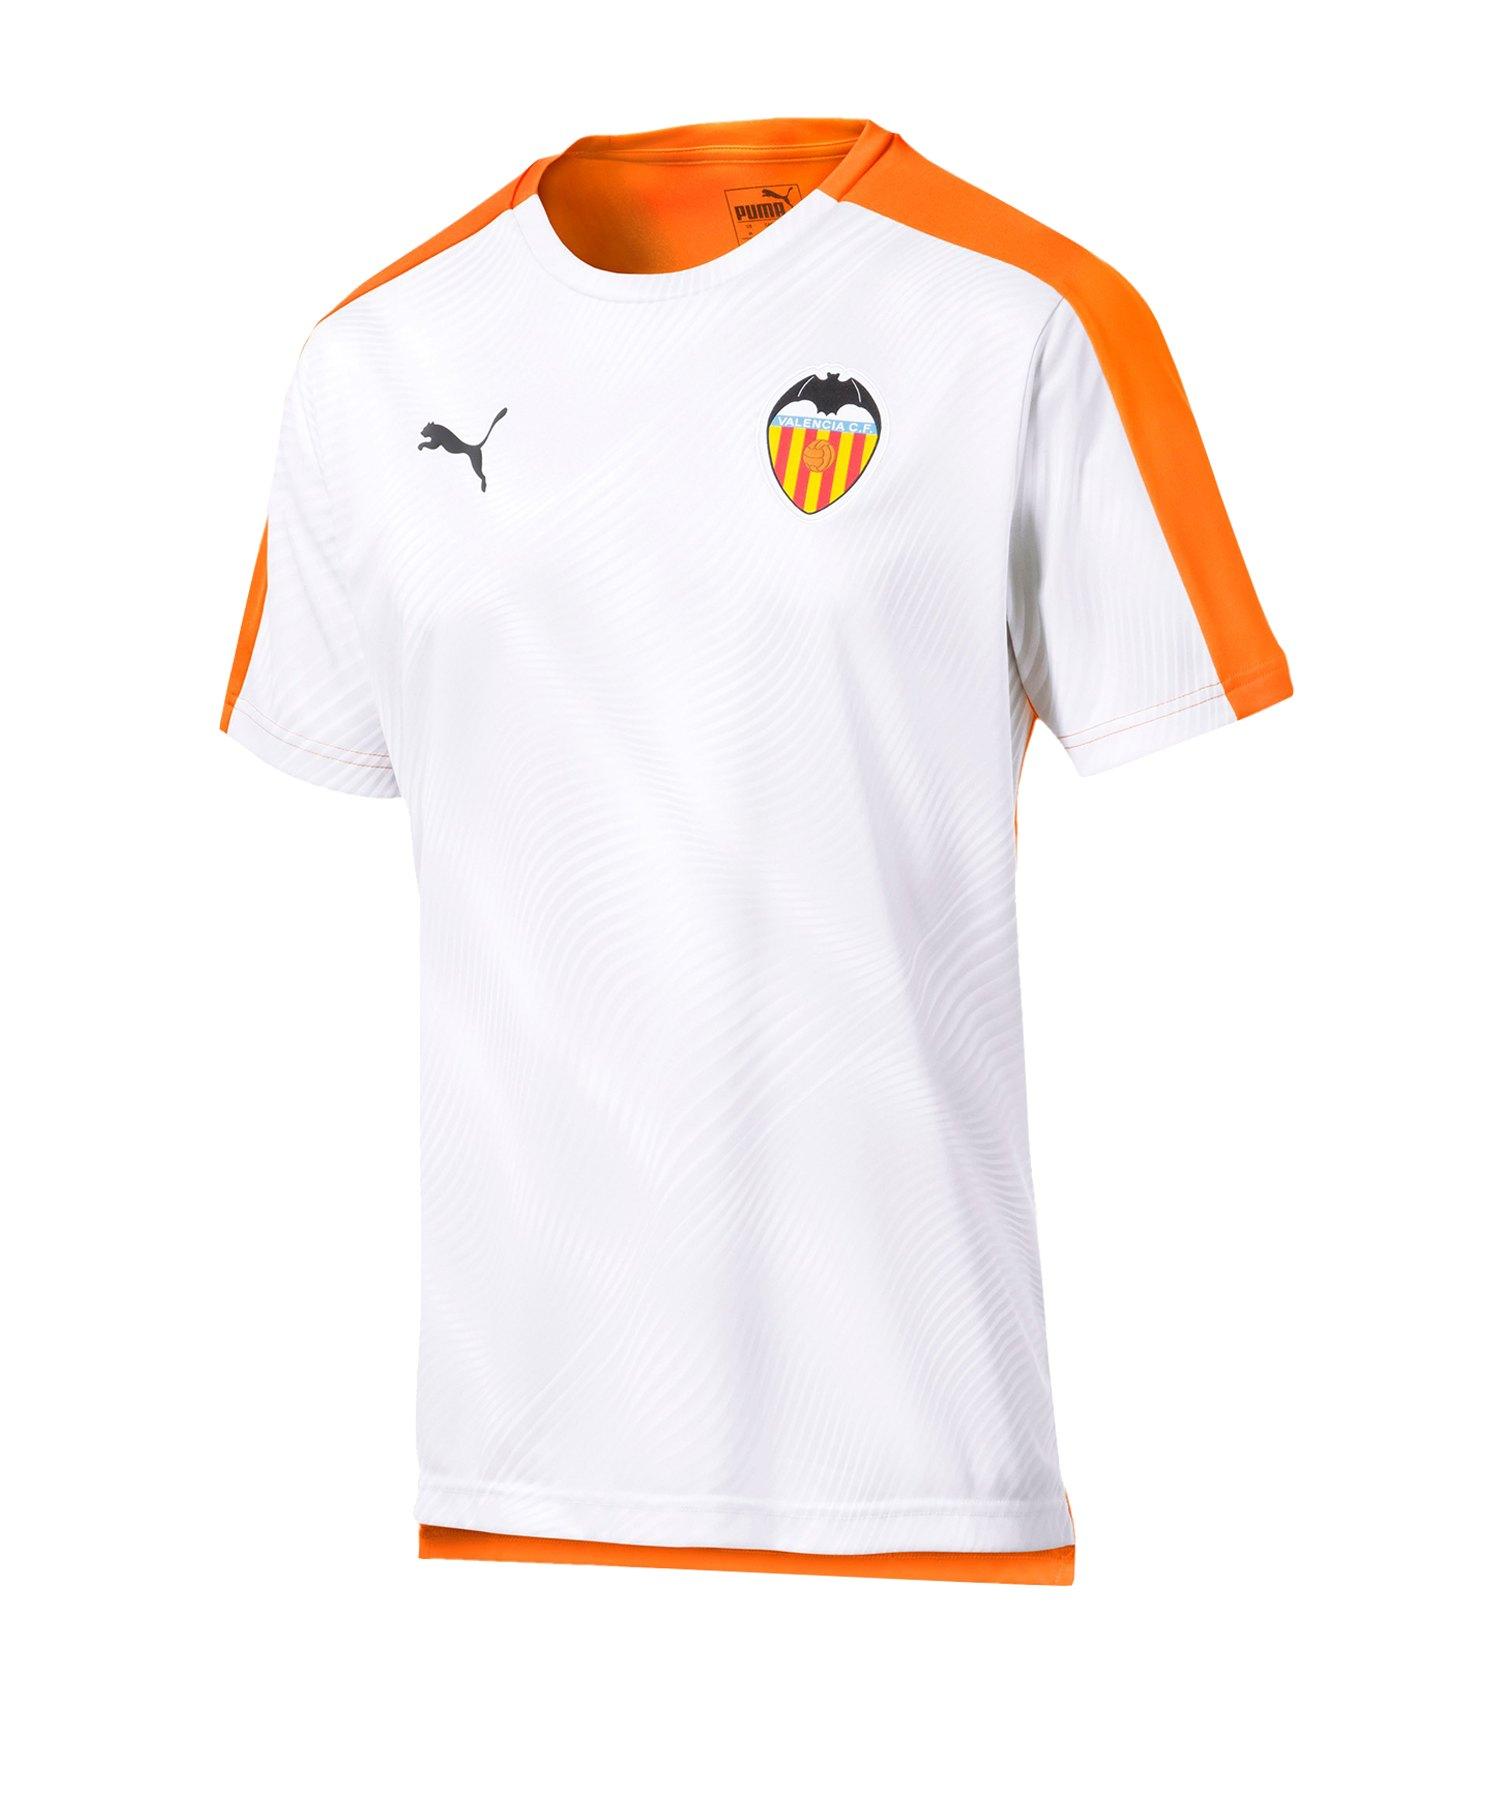 PUMA FC Valencia Prematch Shirt Orange Weiss F01 - Orange